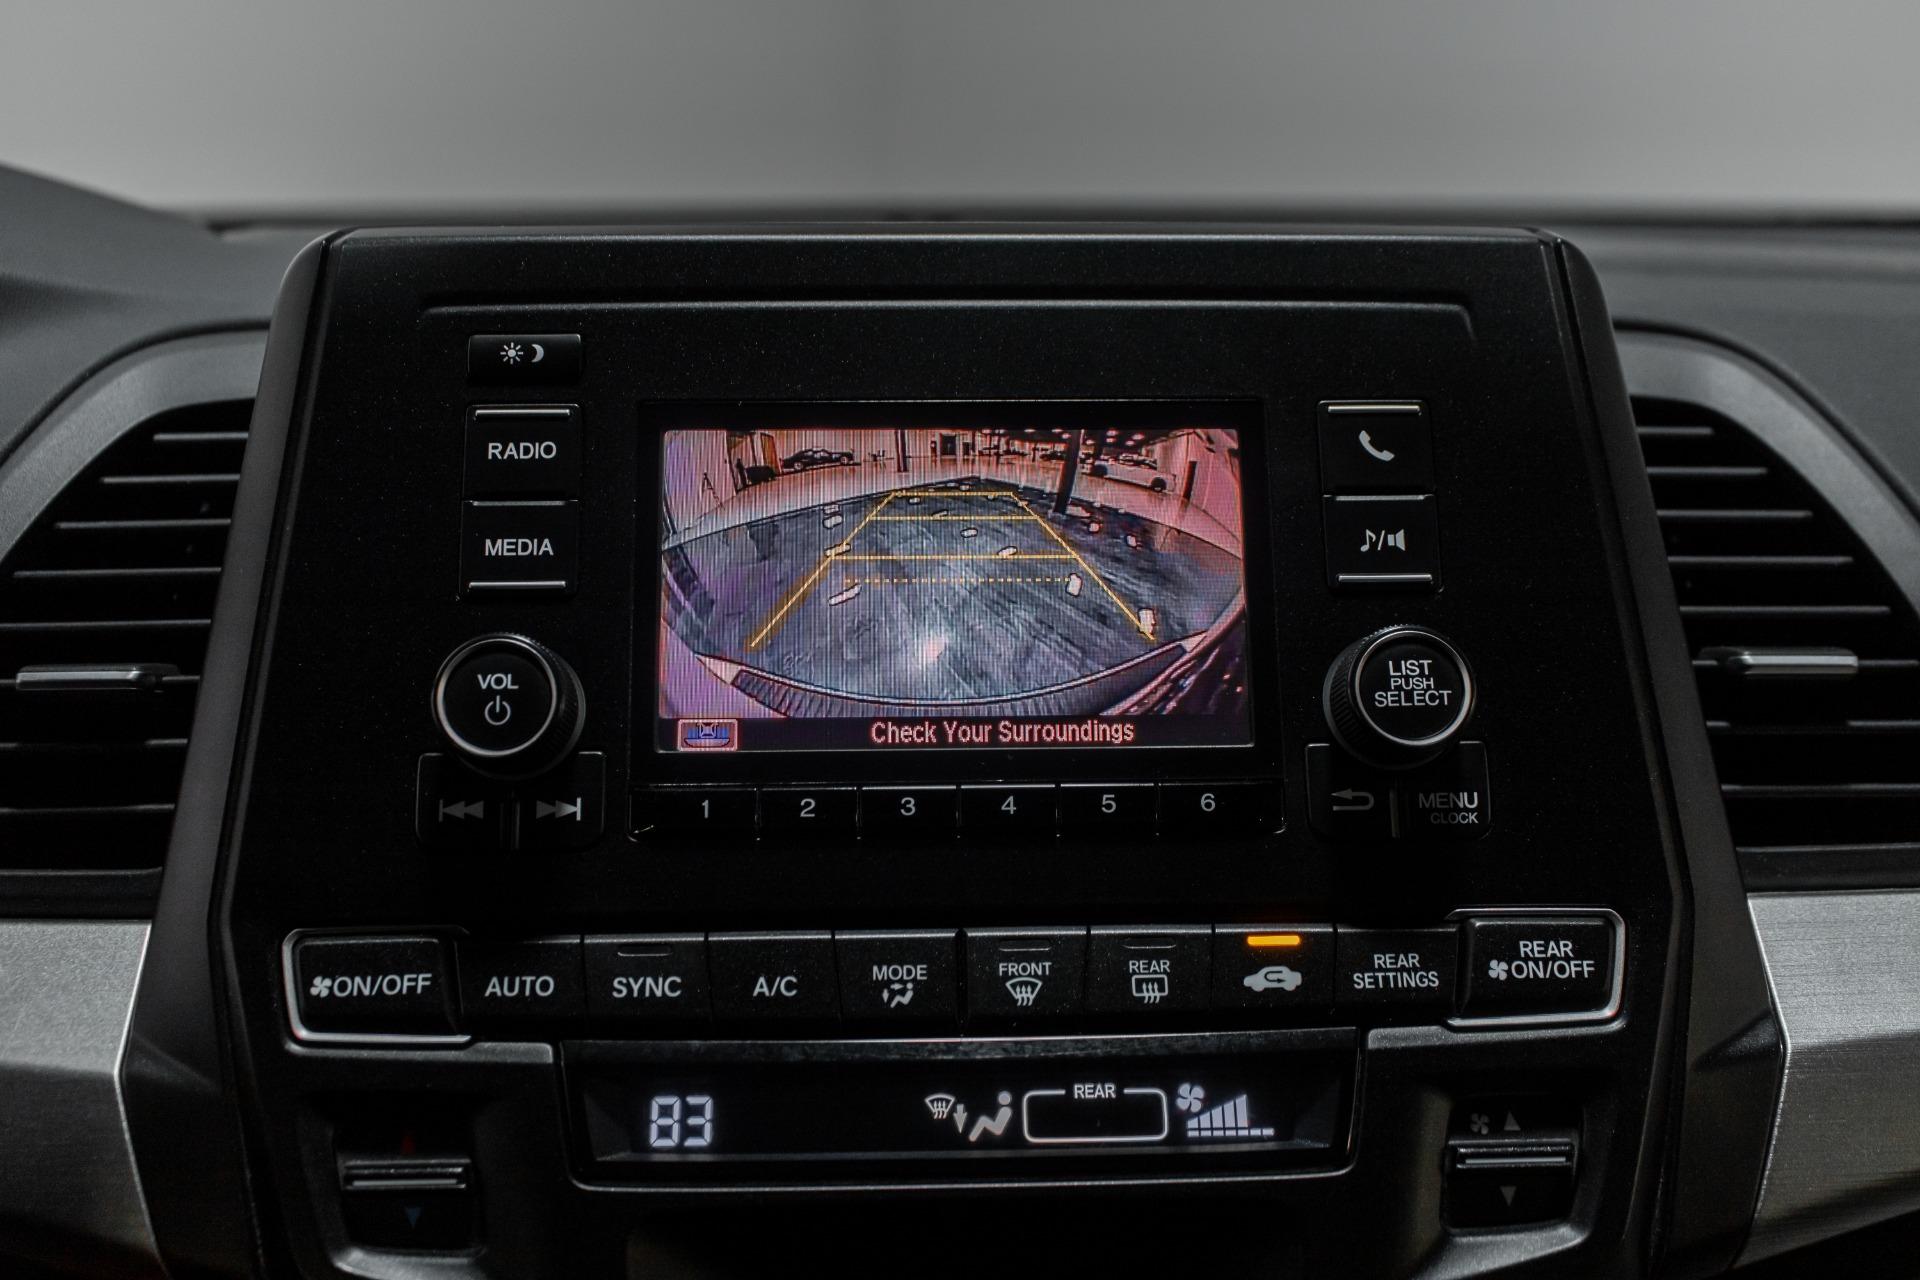 Used 2018 Honda Odyssey LX Minivan 4D